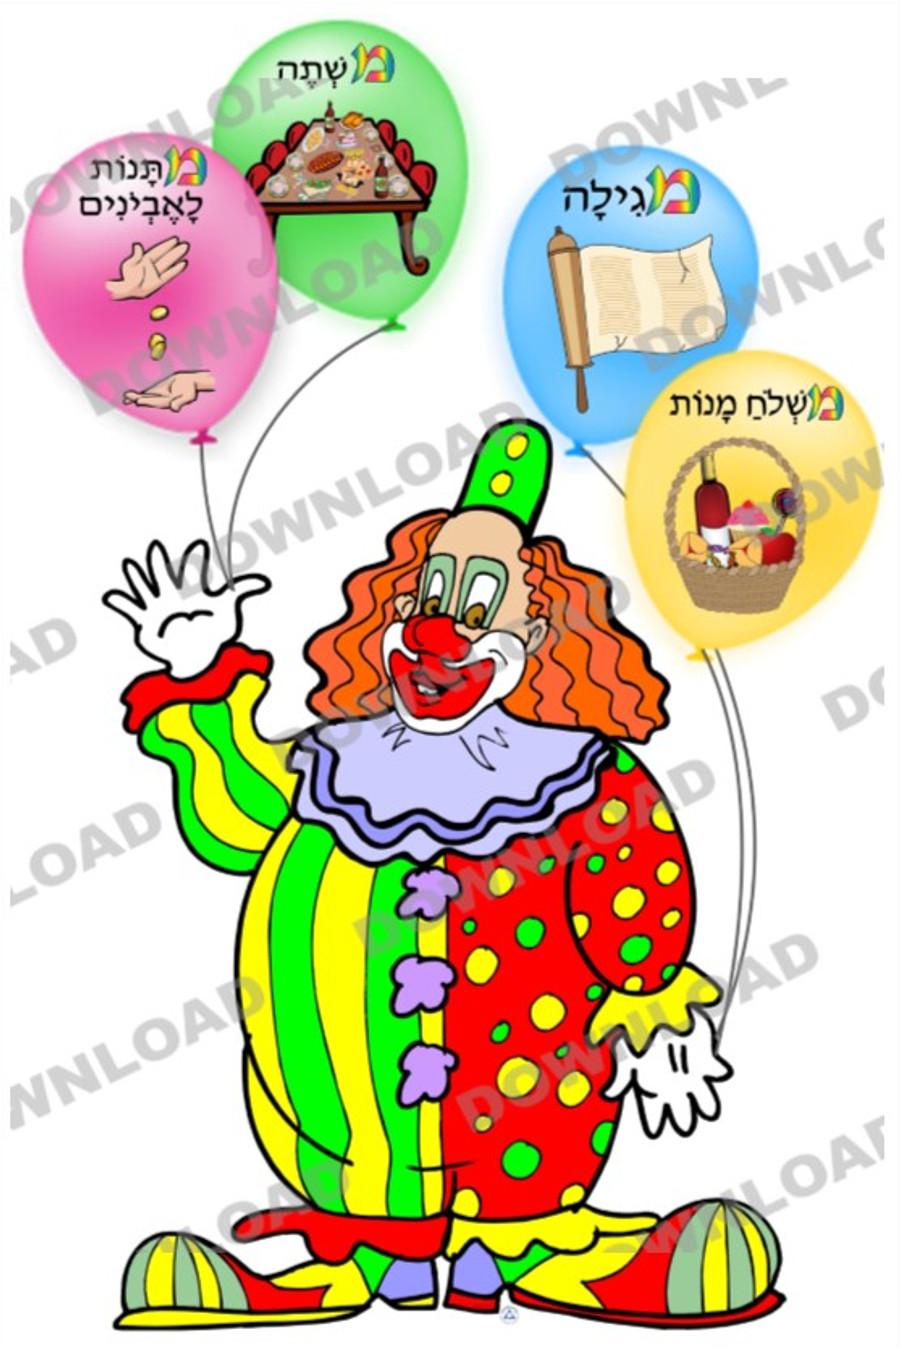 4 Mitzvot Clown (a downloadable item)